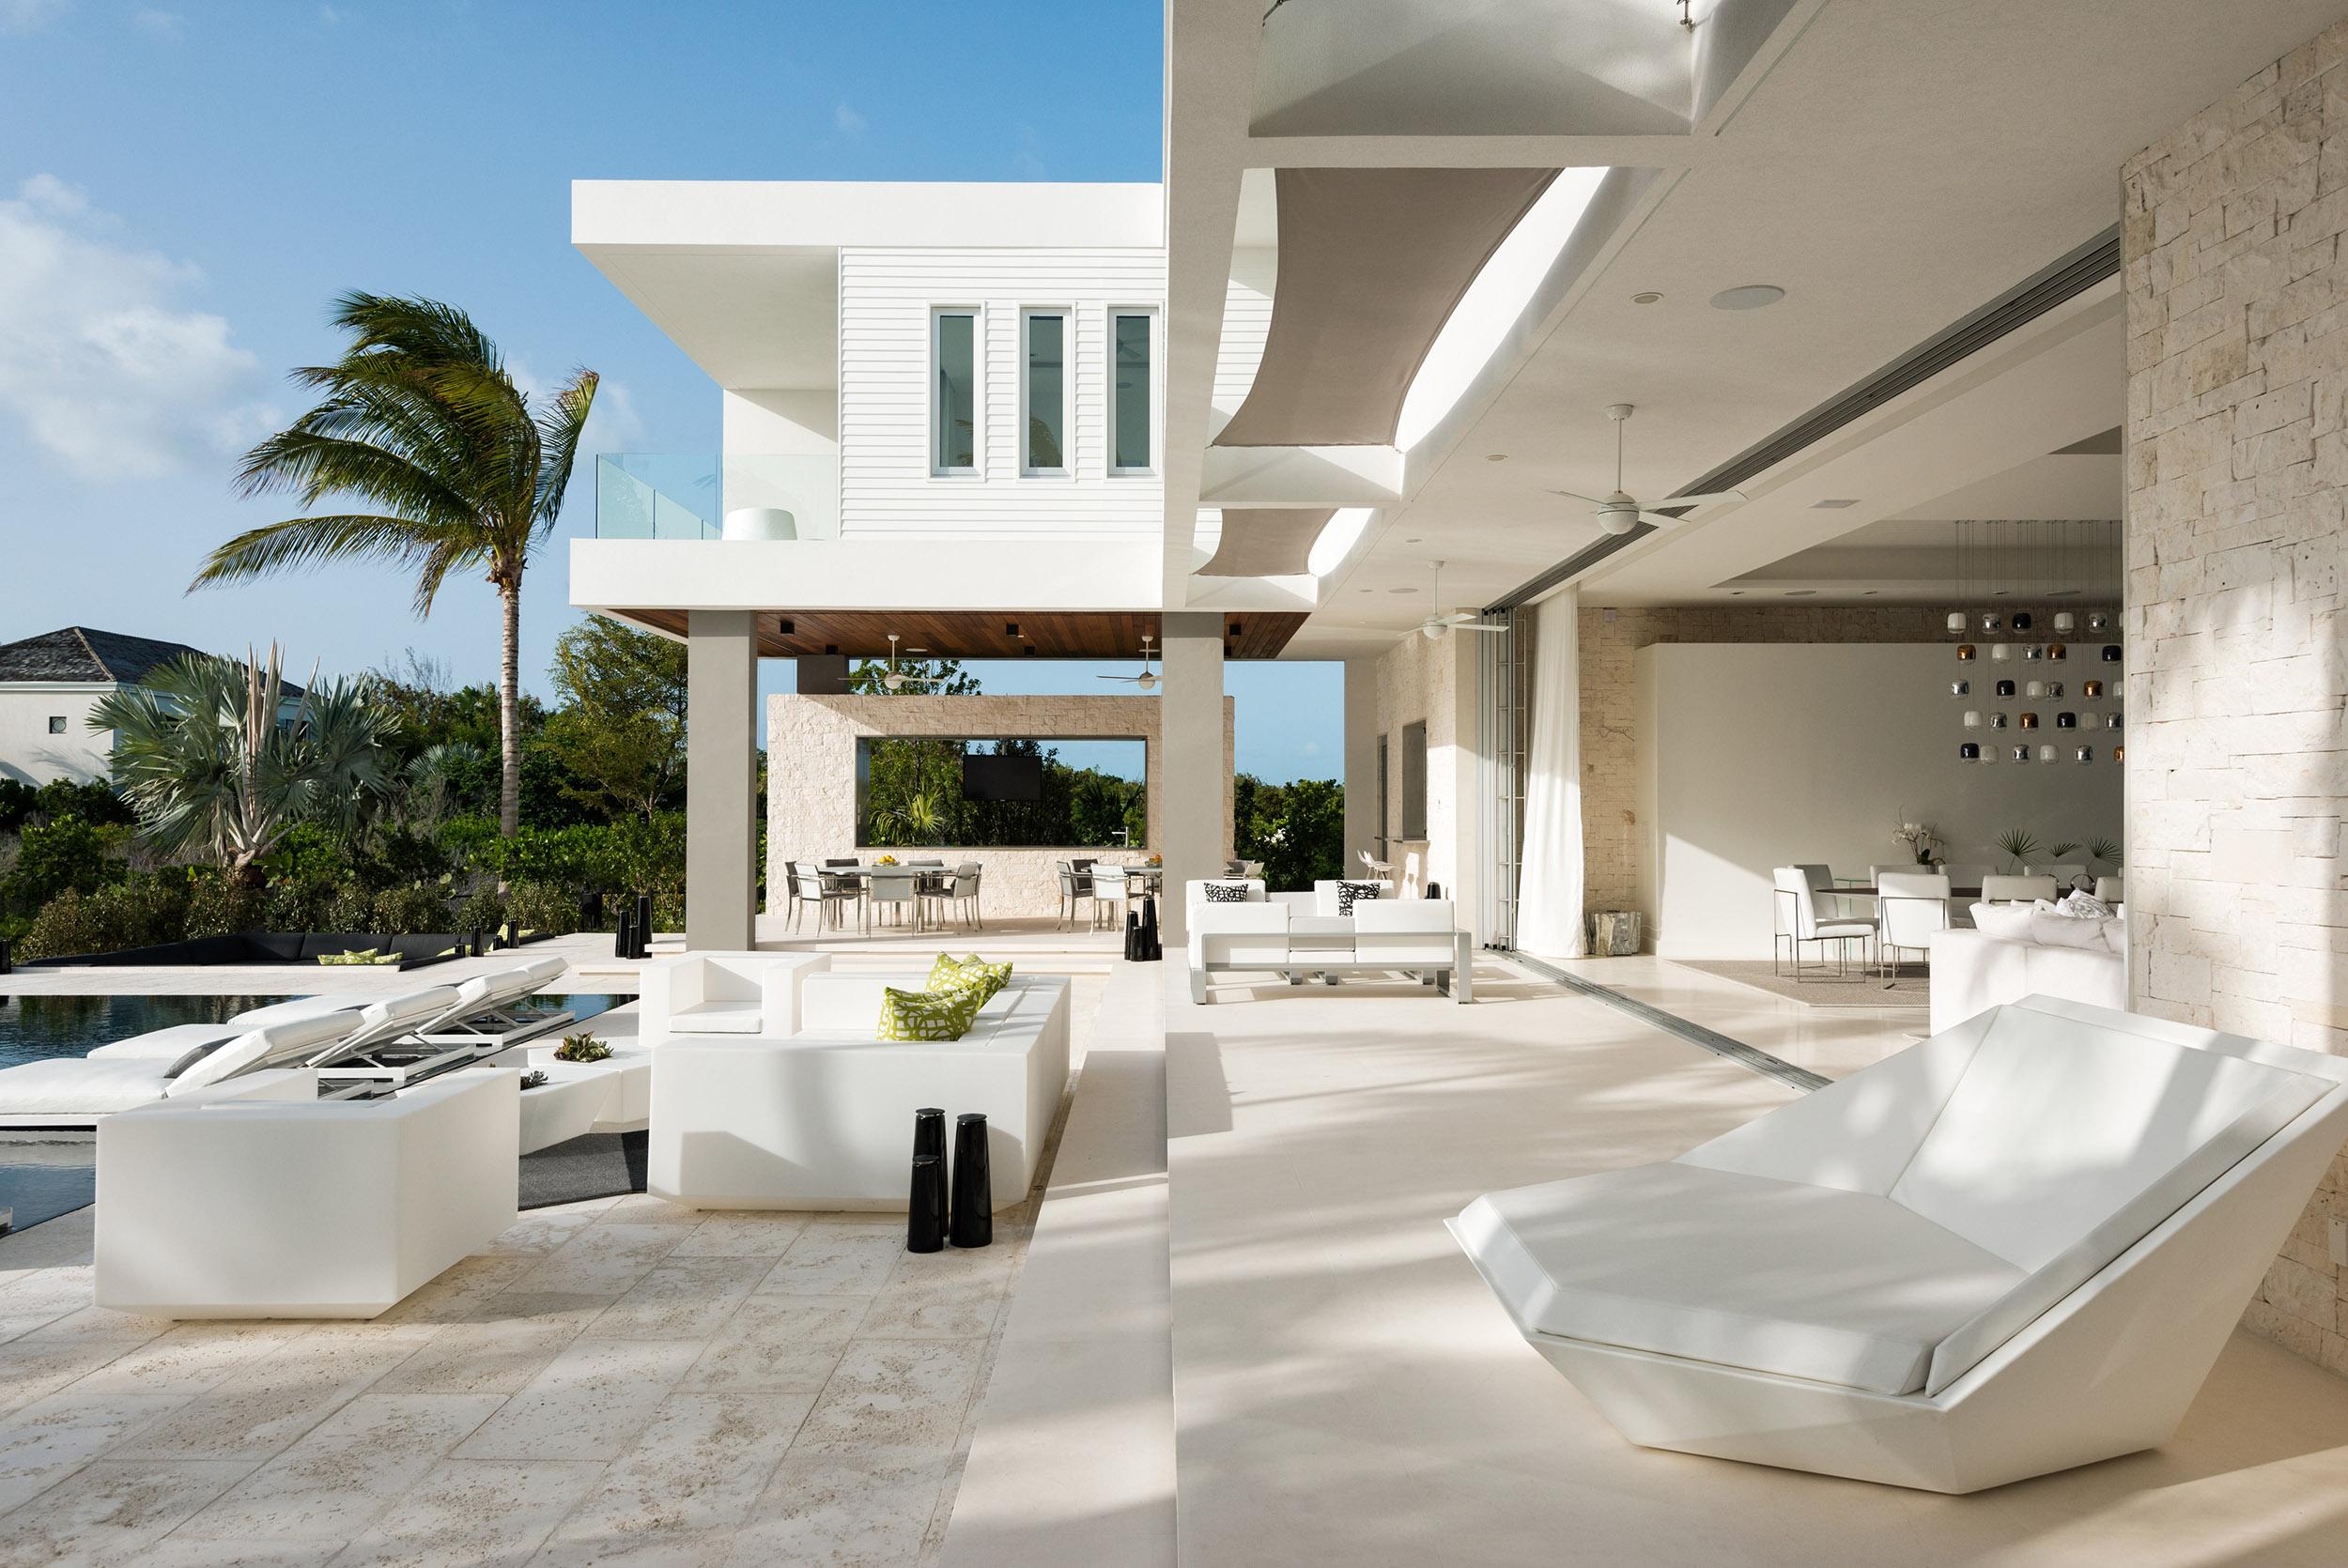 Villa Awa - view of the pool terrace